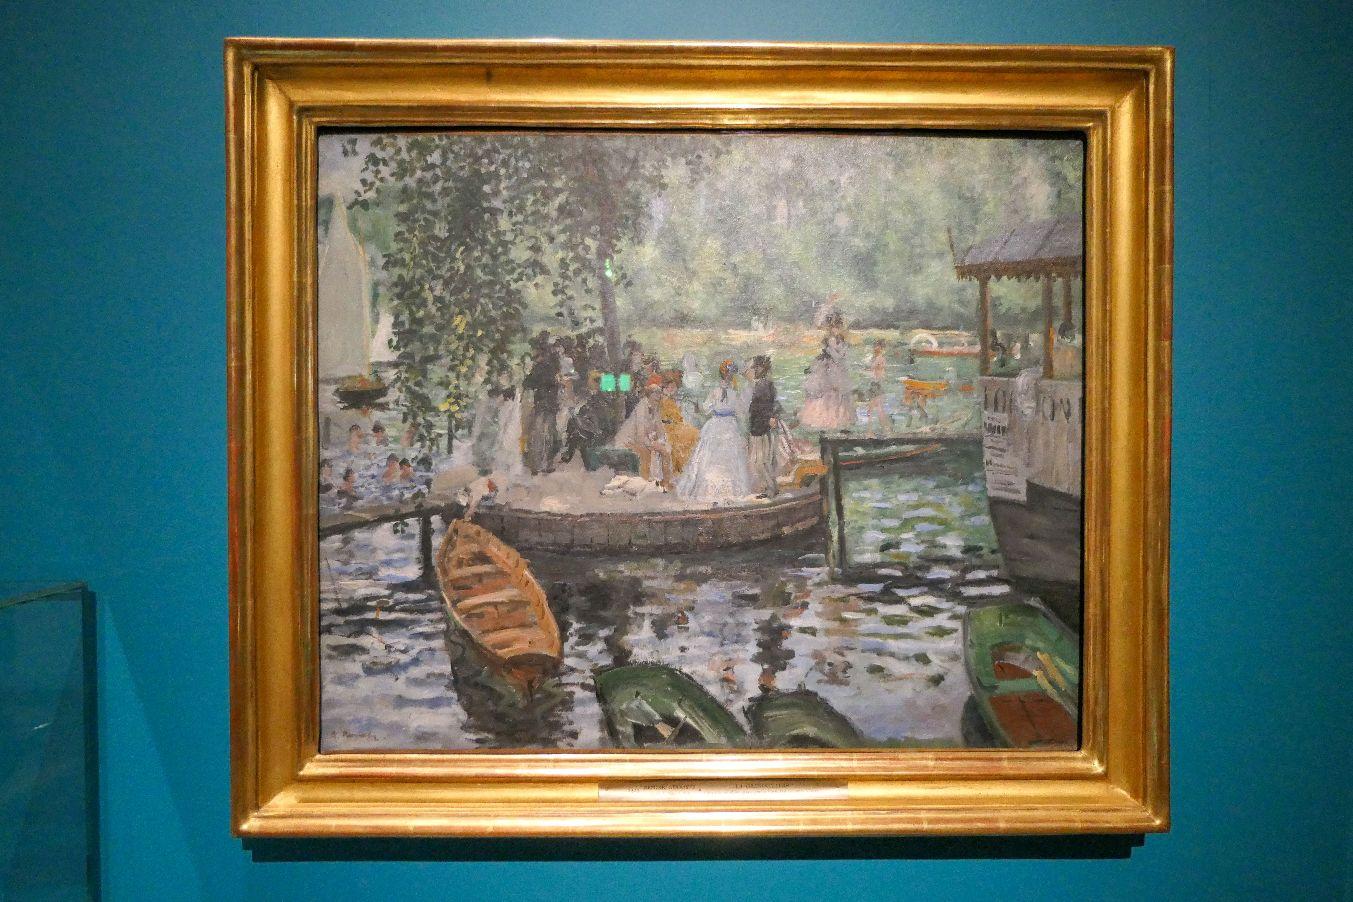 Stockholm Schweden Nationalmuseum Museum Kunst Gemälde La Grénouillere Auguste Renoir